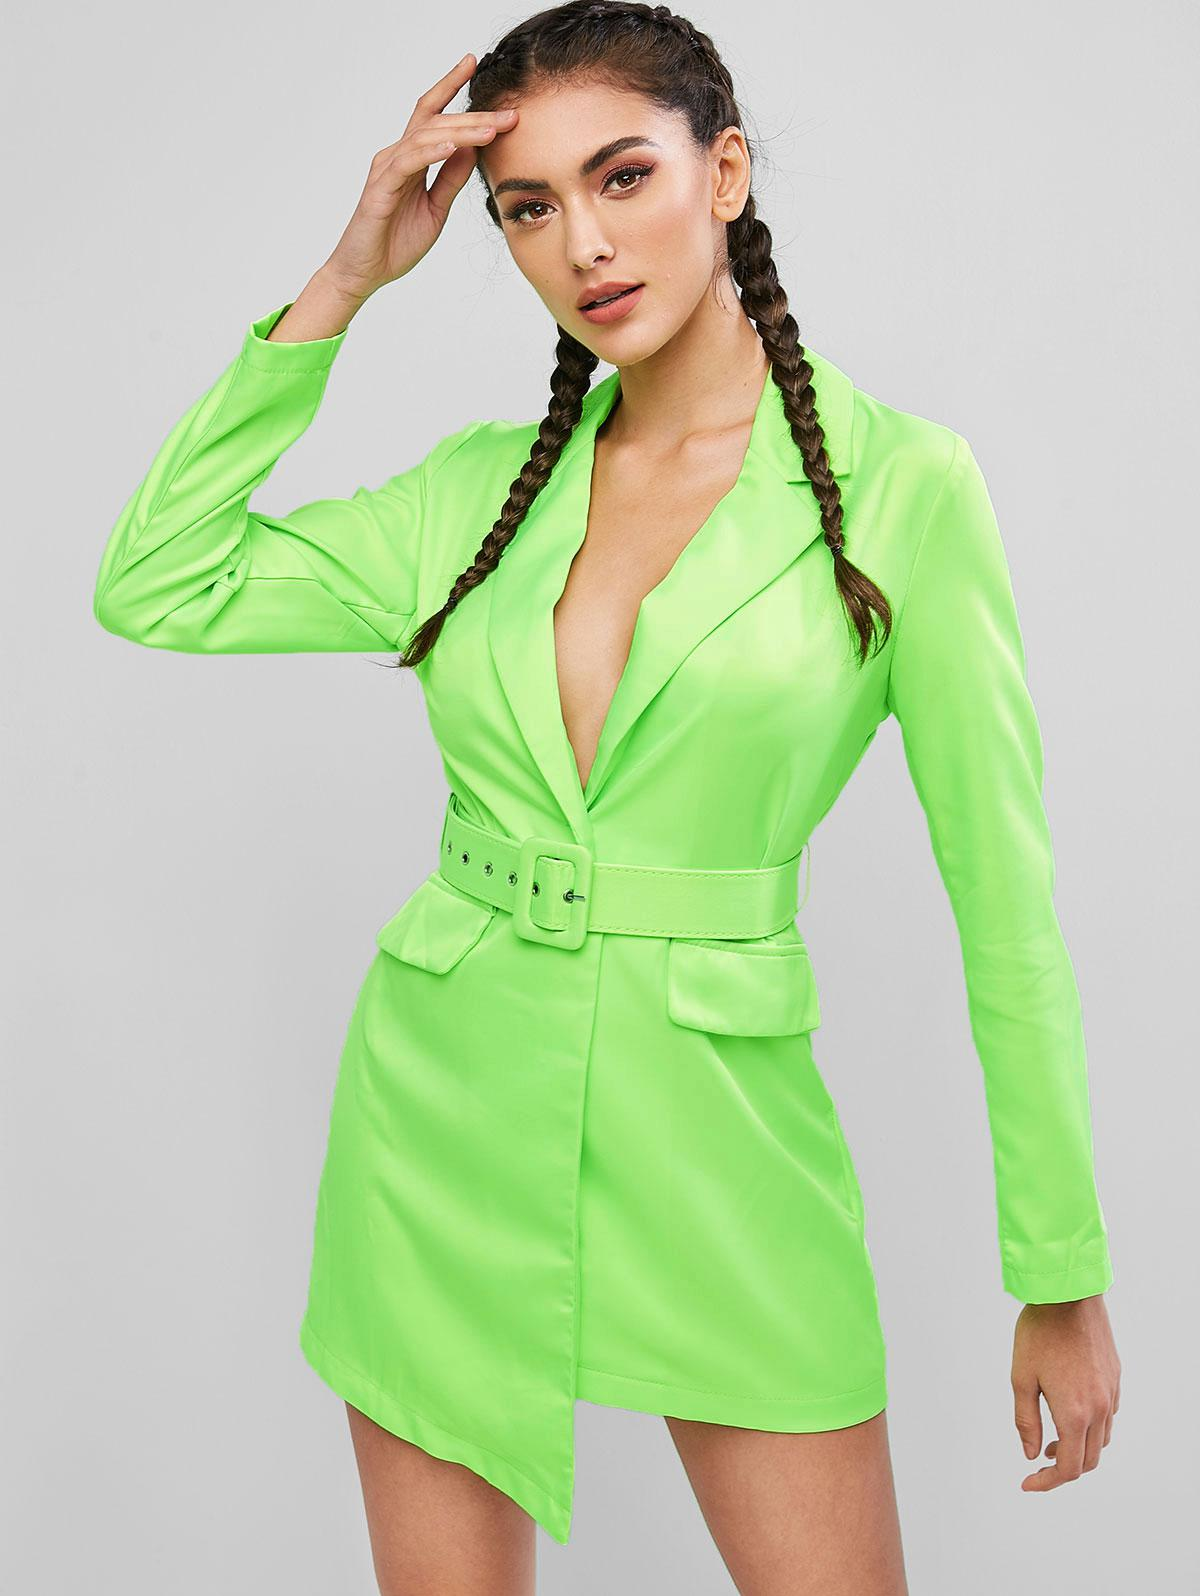 Neon Ceinturée D'Un Bouton Blazer Robe